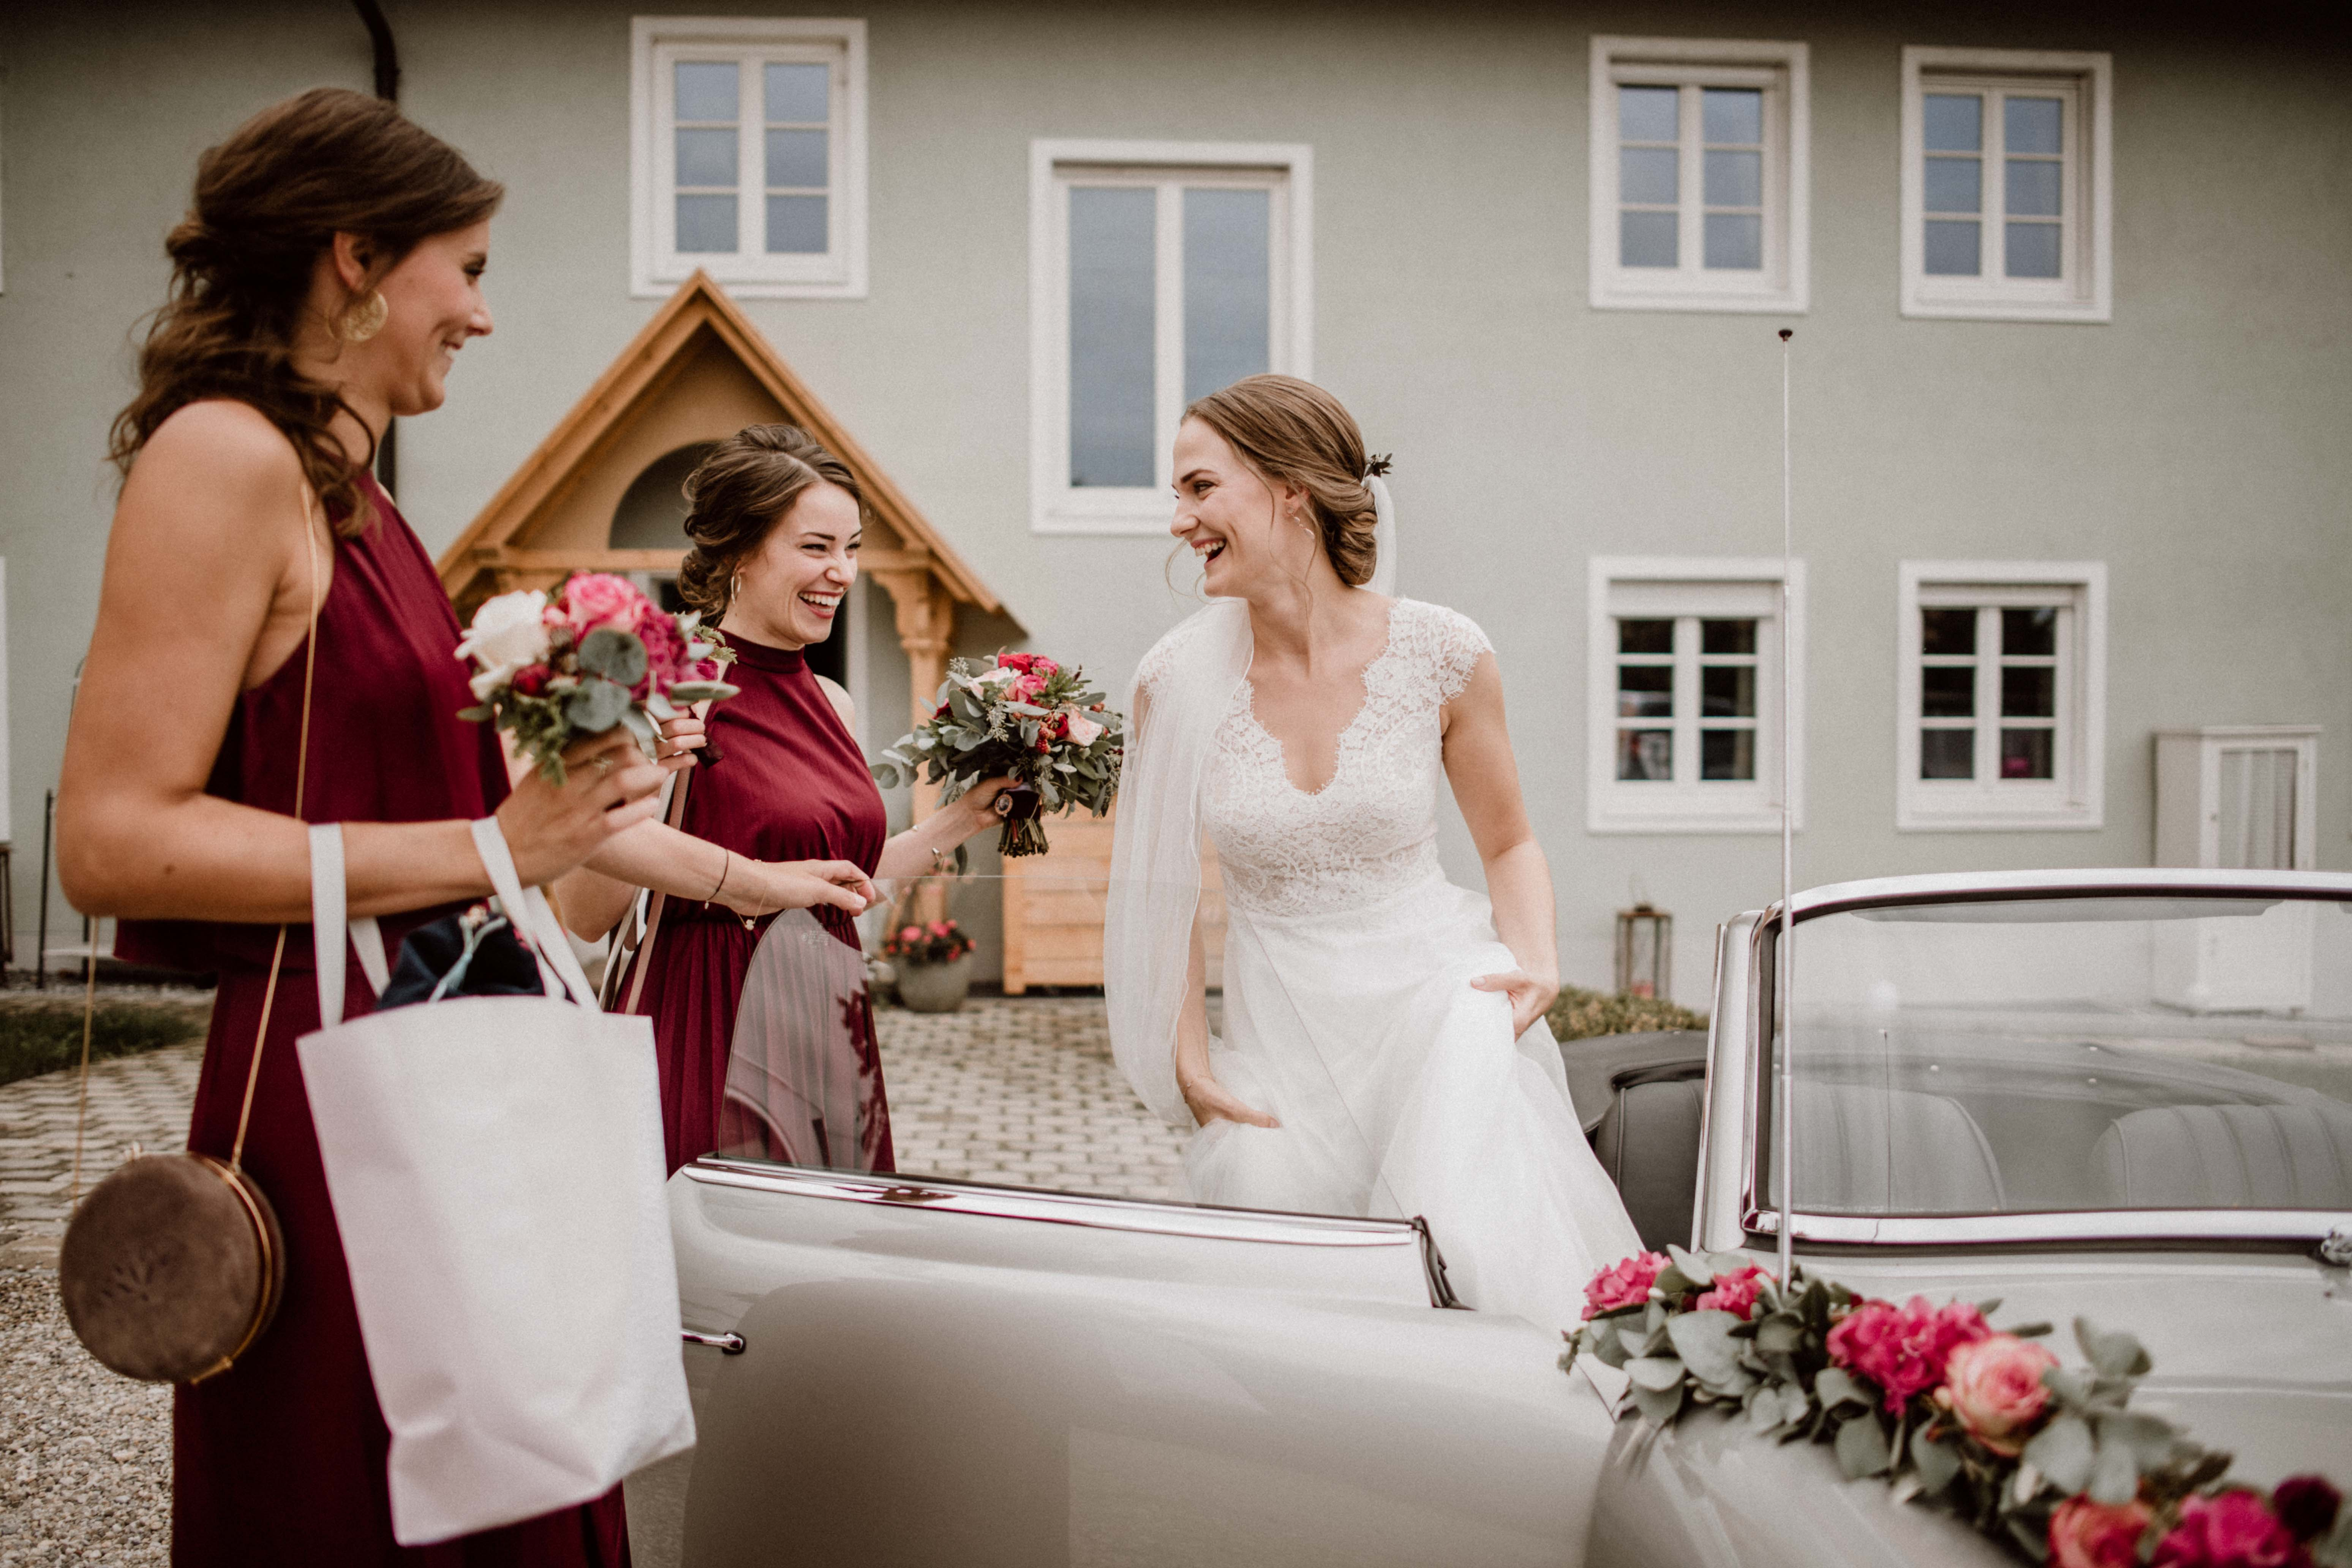 girlsquad bridesmaids sonja poehlmann photography couples muenchen bayern